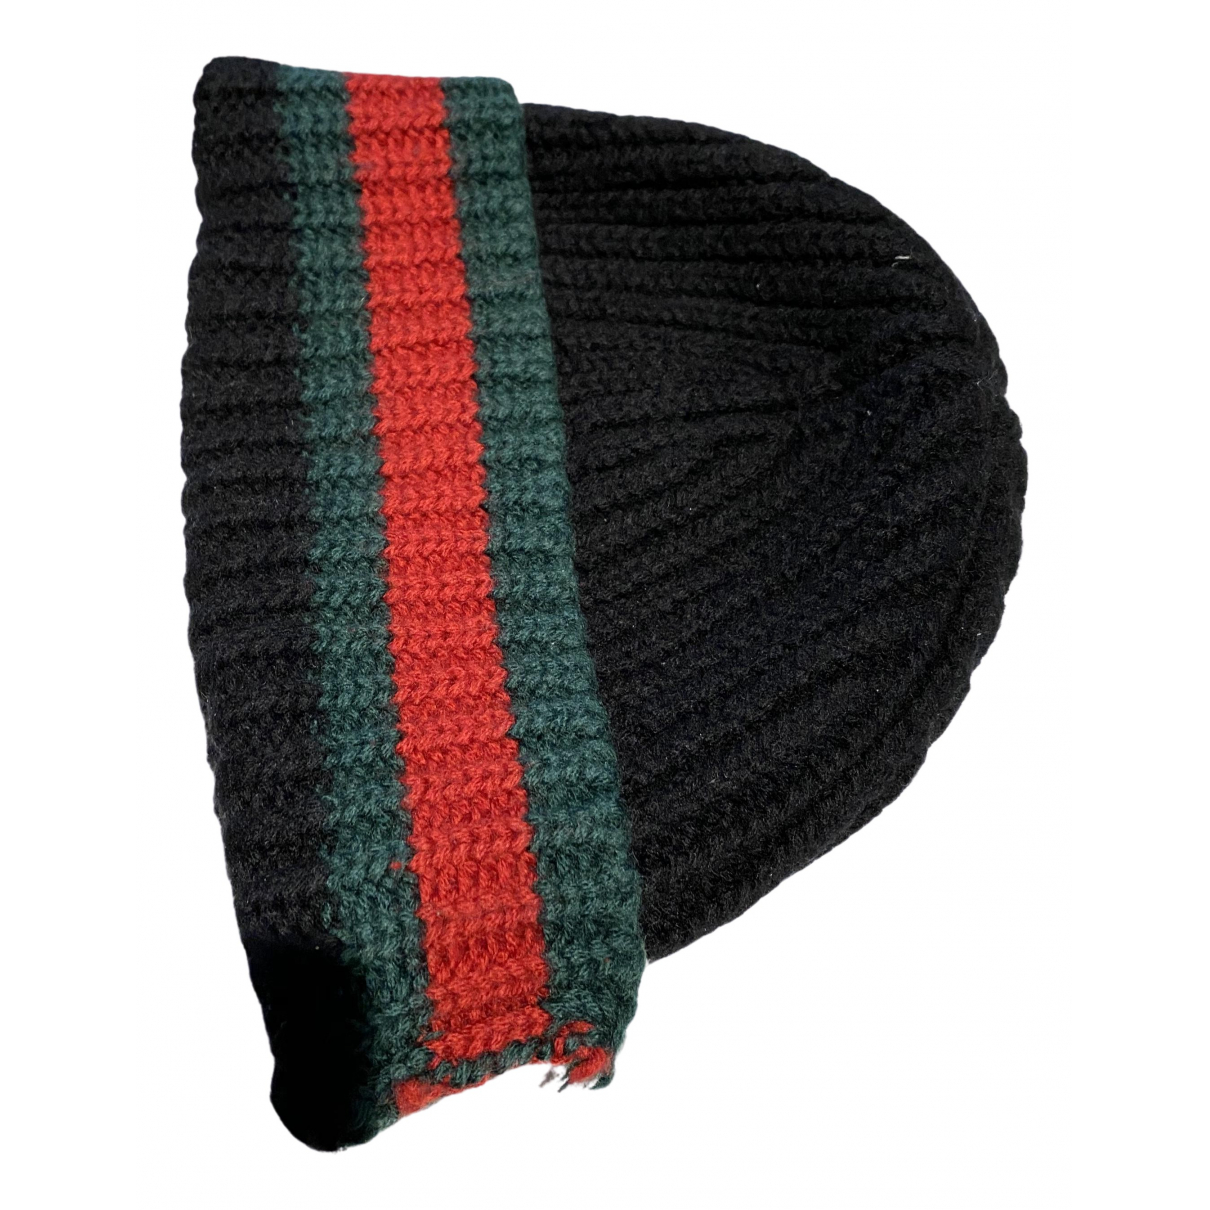 Gucci \N Black Wool hat & pull on hat for Men S International